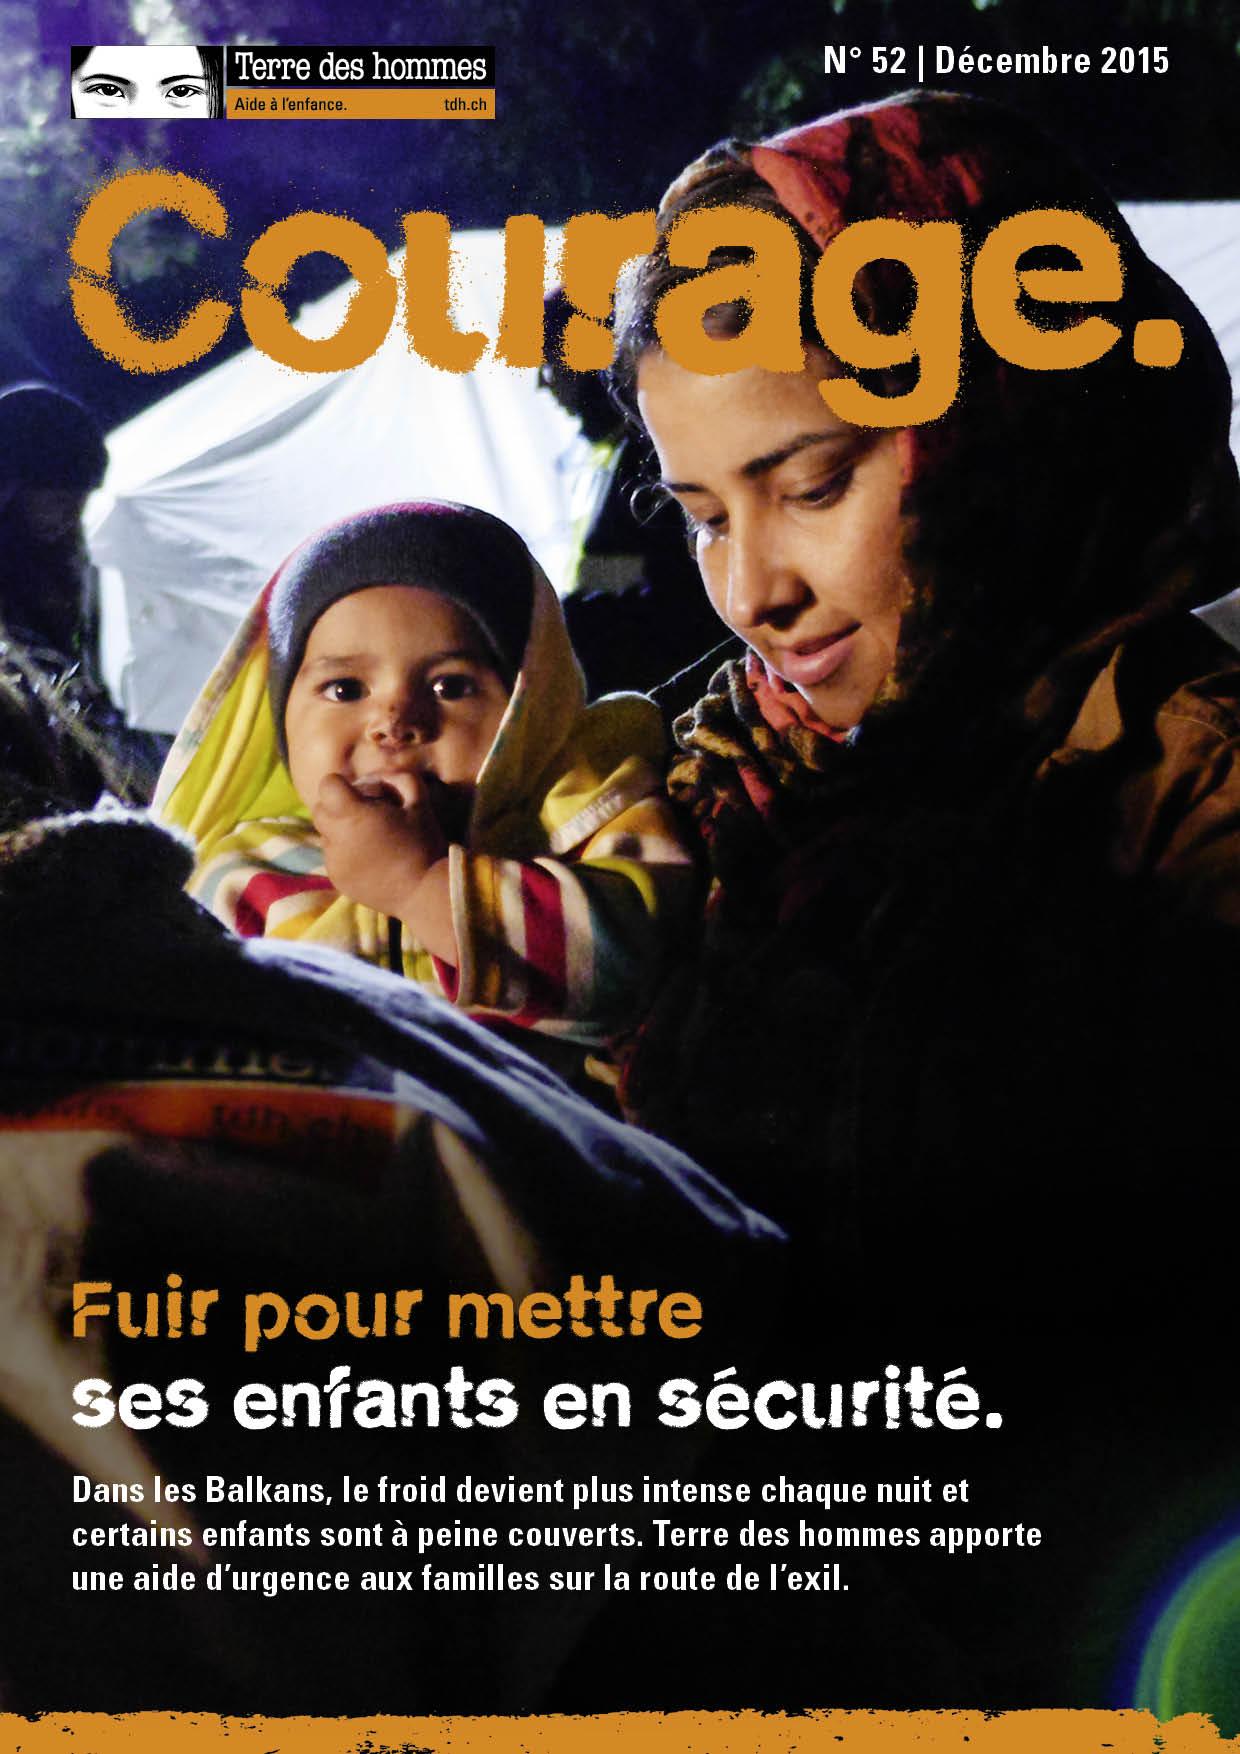 54f6e48a-13a3-43fc-aabe-04b3e205a89e_tdh_magazine52_fr1_original